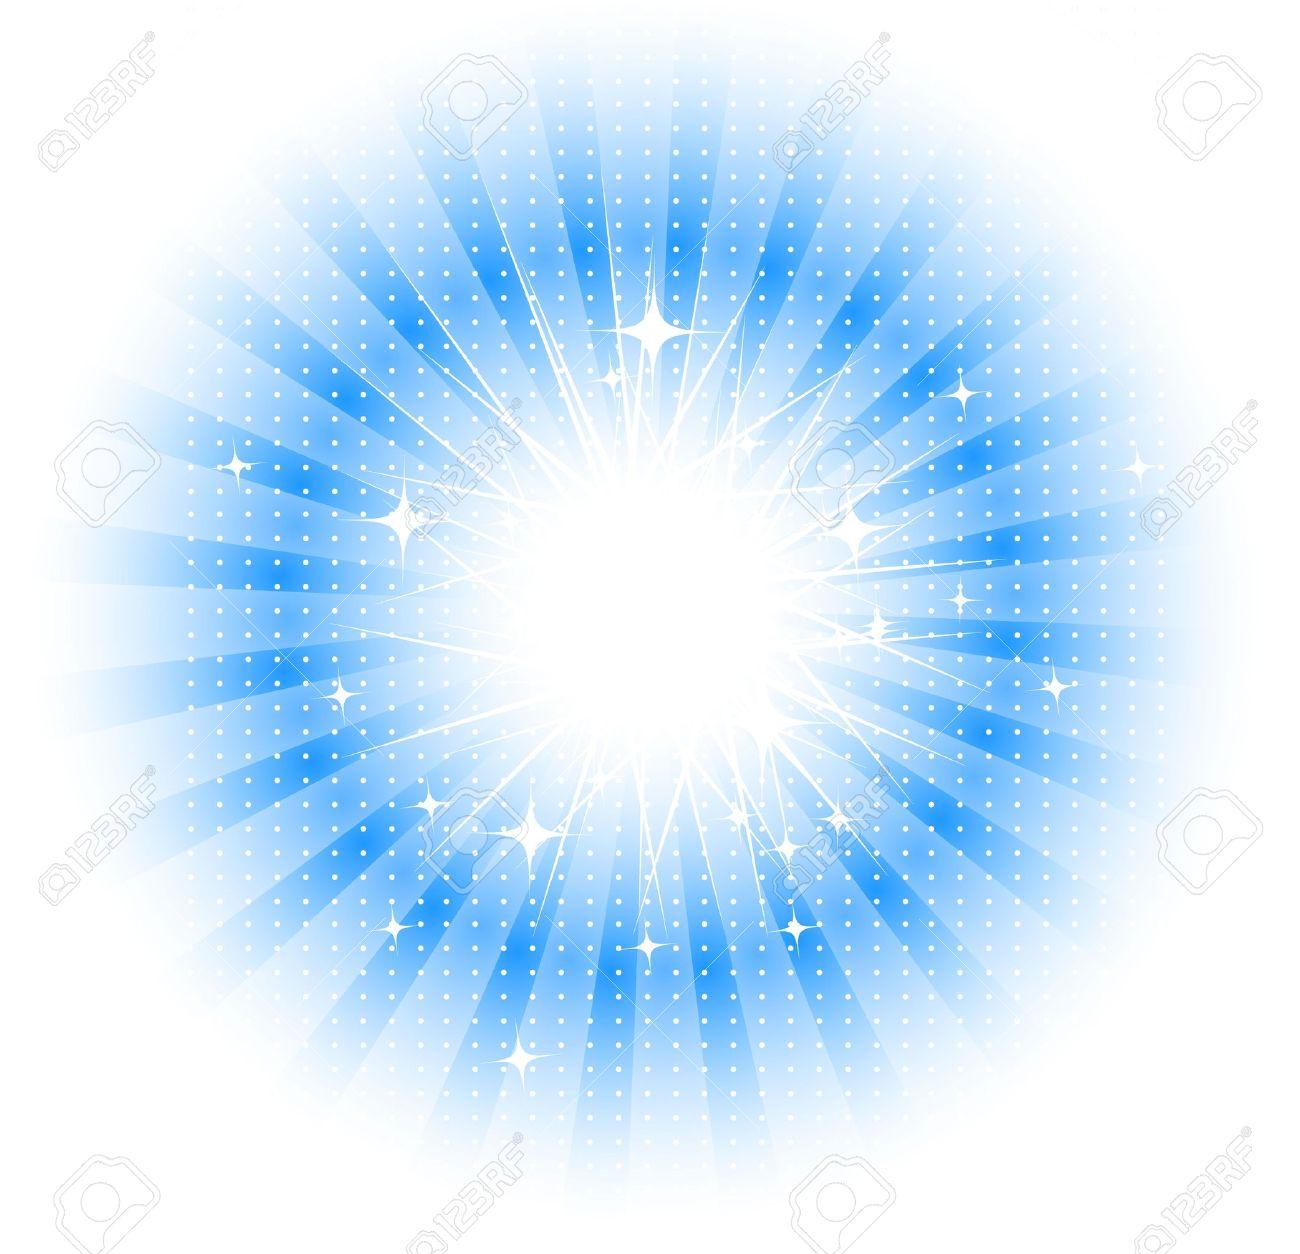 Sunrays HD PNG - 92844